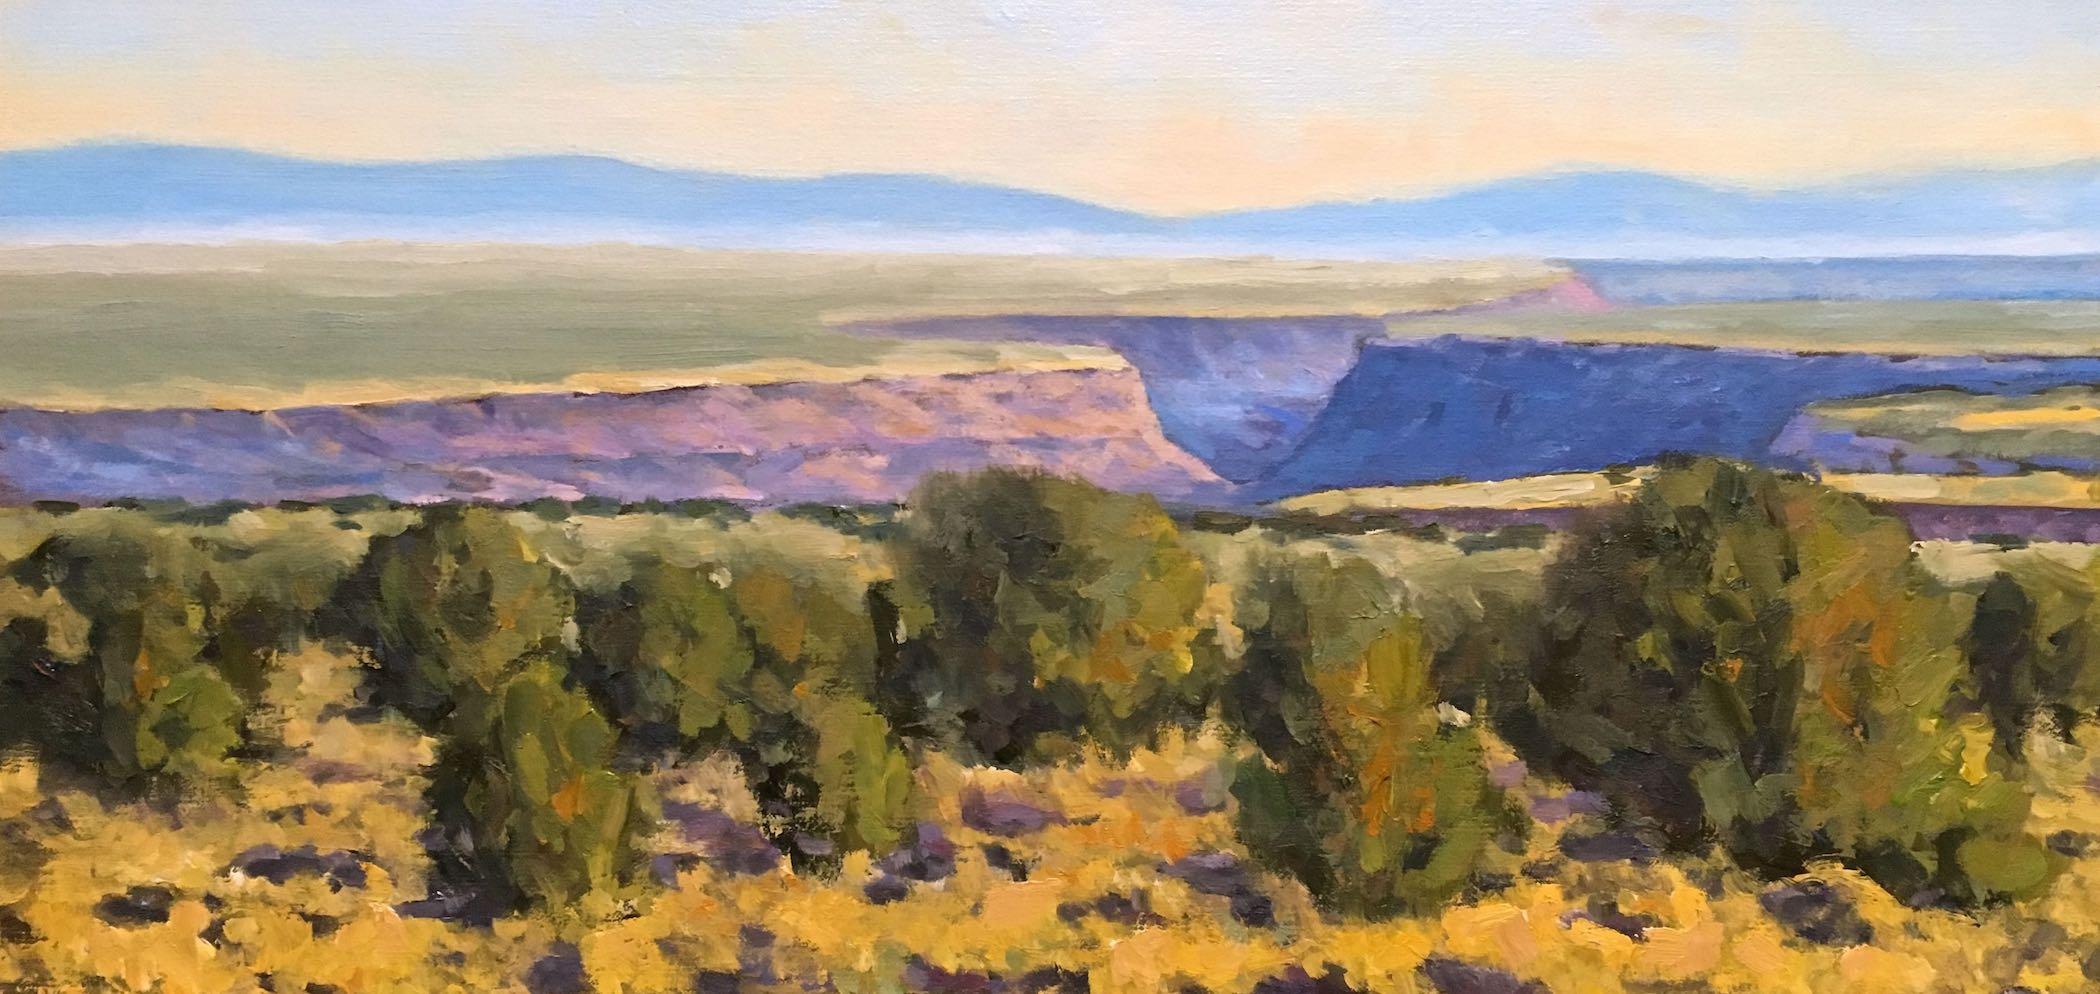 Chris Miller: Rio Grande Gorge Near Taos